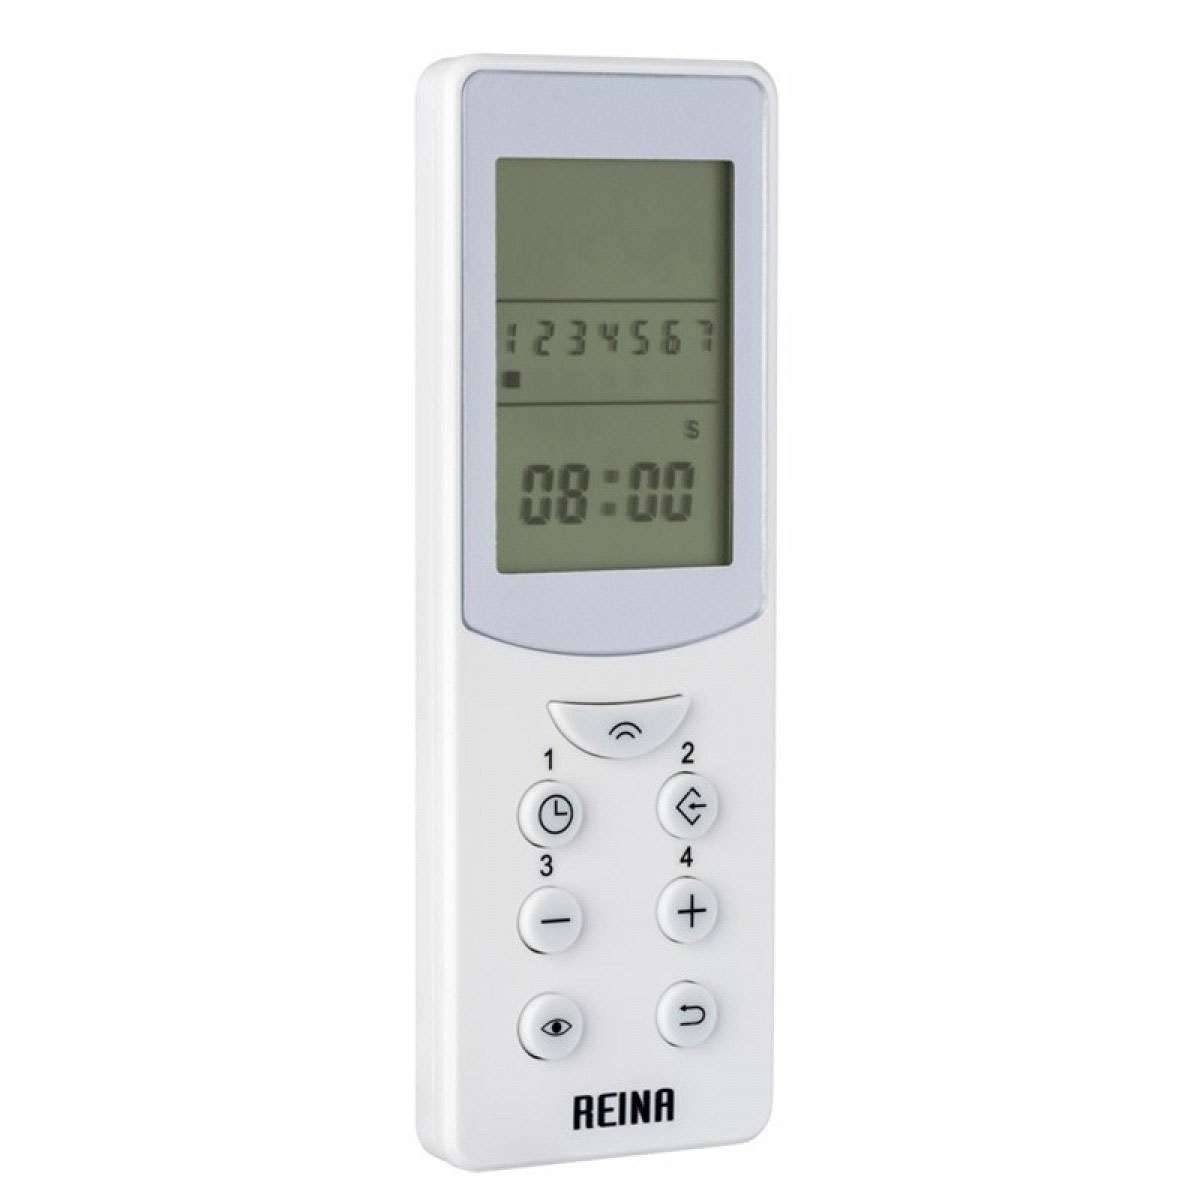 Reina Diva Thermostatic Electric Straight Heated Towel Rail 800mm H x 500mm W Chrome-1